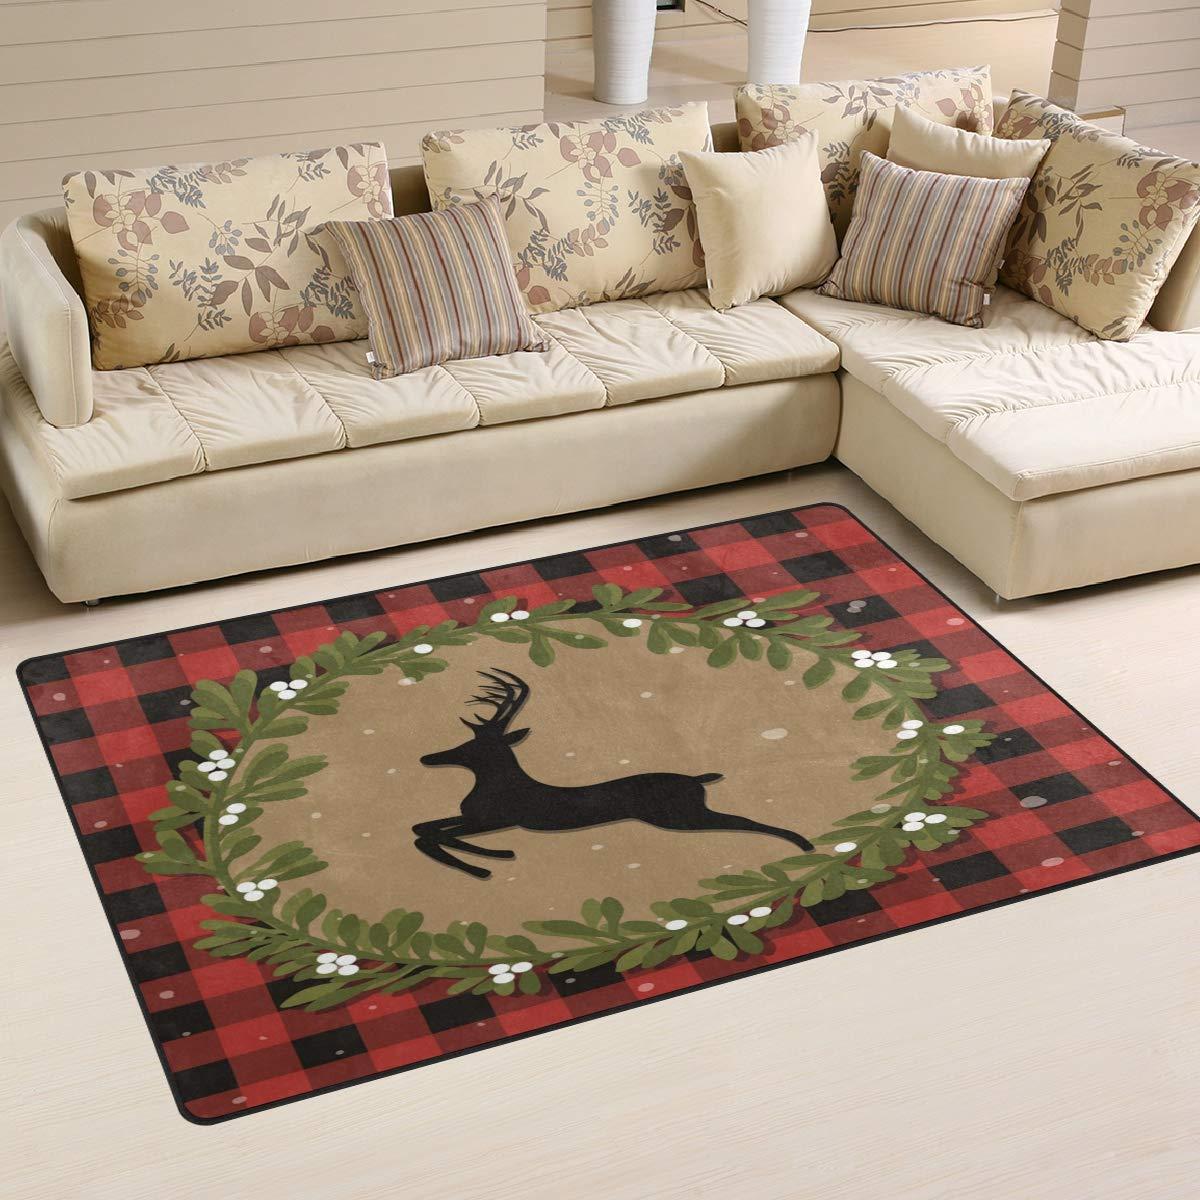 ALAZA Merry Christmas Reindeer Buffalo Plaid Non Slip Area Rug 2' x 3', Modern Floor Rugs Mat for Living Room Bedroom Dinning Room Home Decor